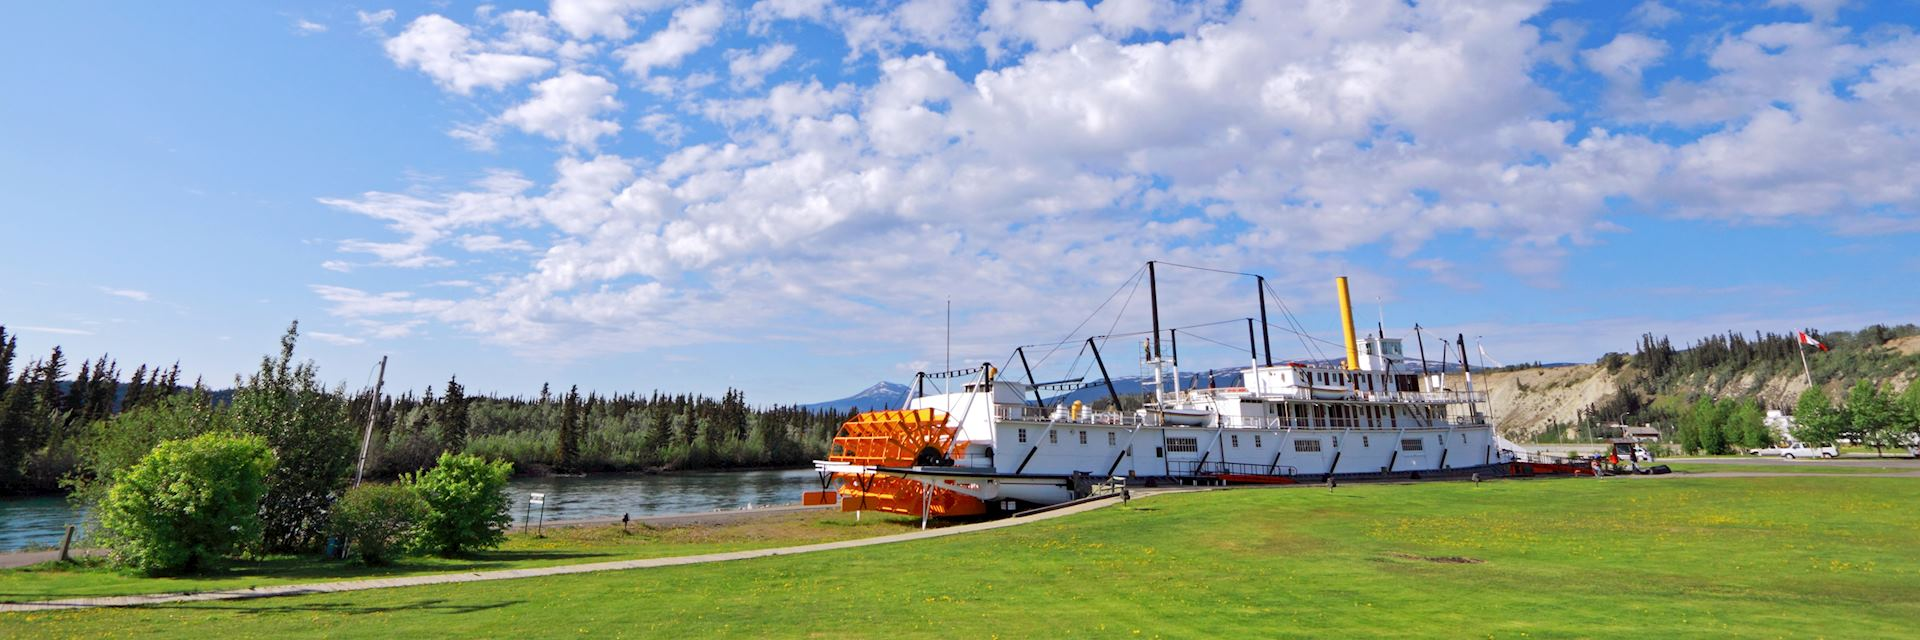 S.S. Klondike National Historic Site, Whitehorse